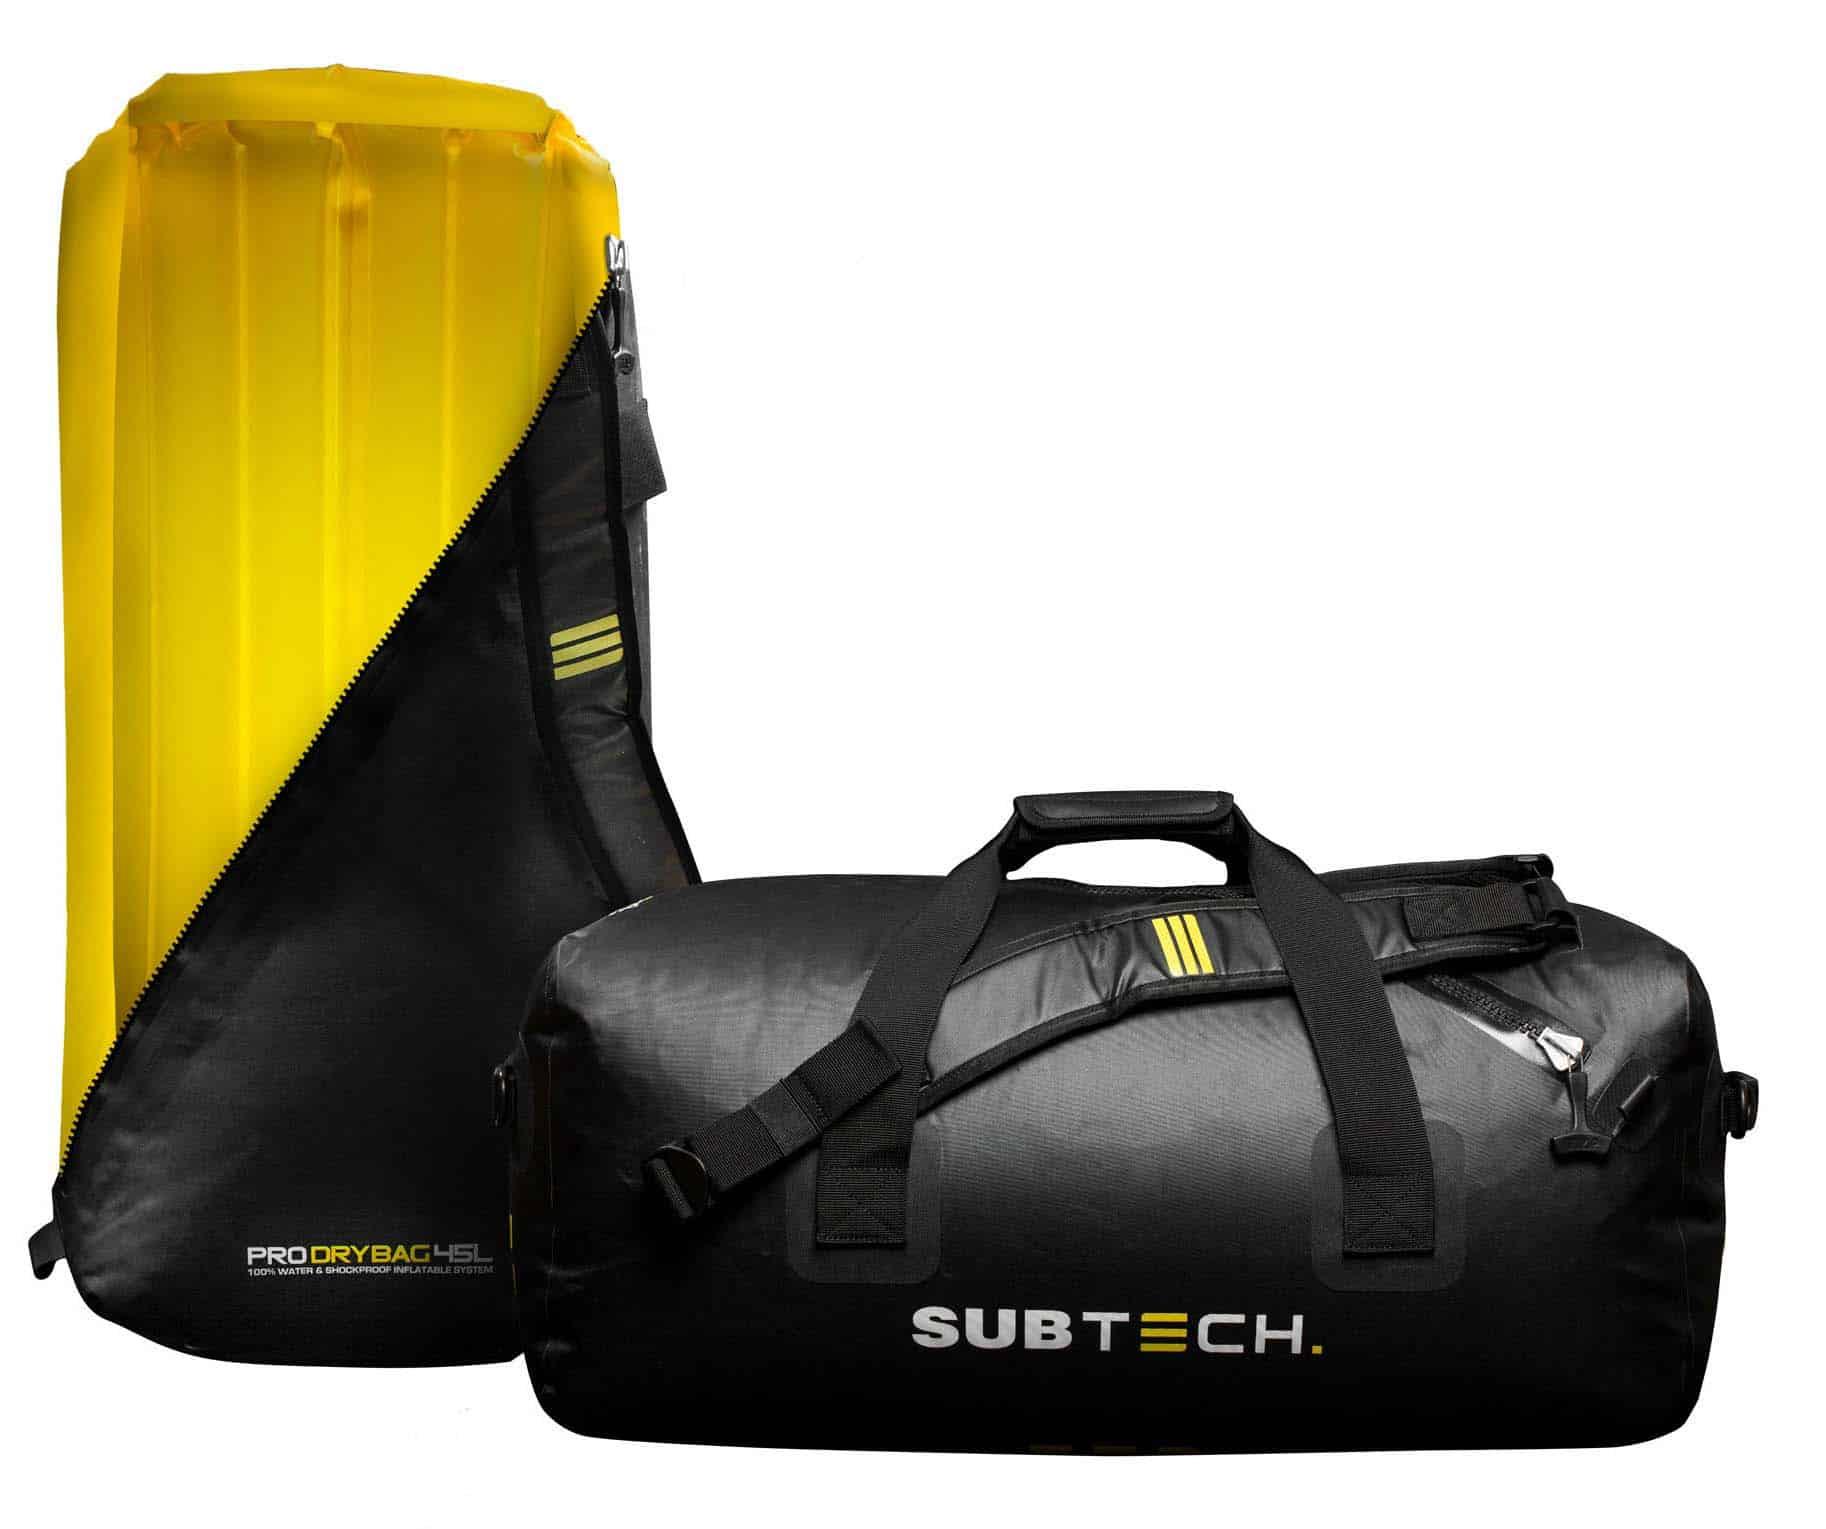 PRO DRYBAG 45L – Waterproof & Shockproof Bag